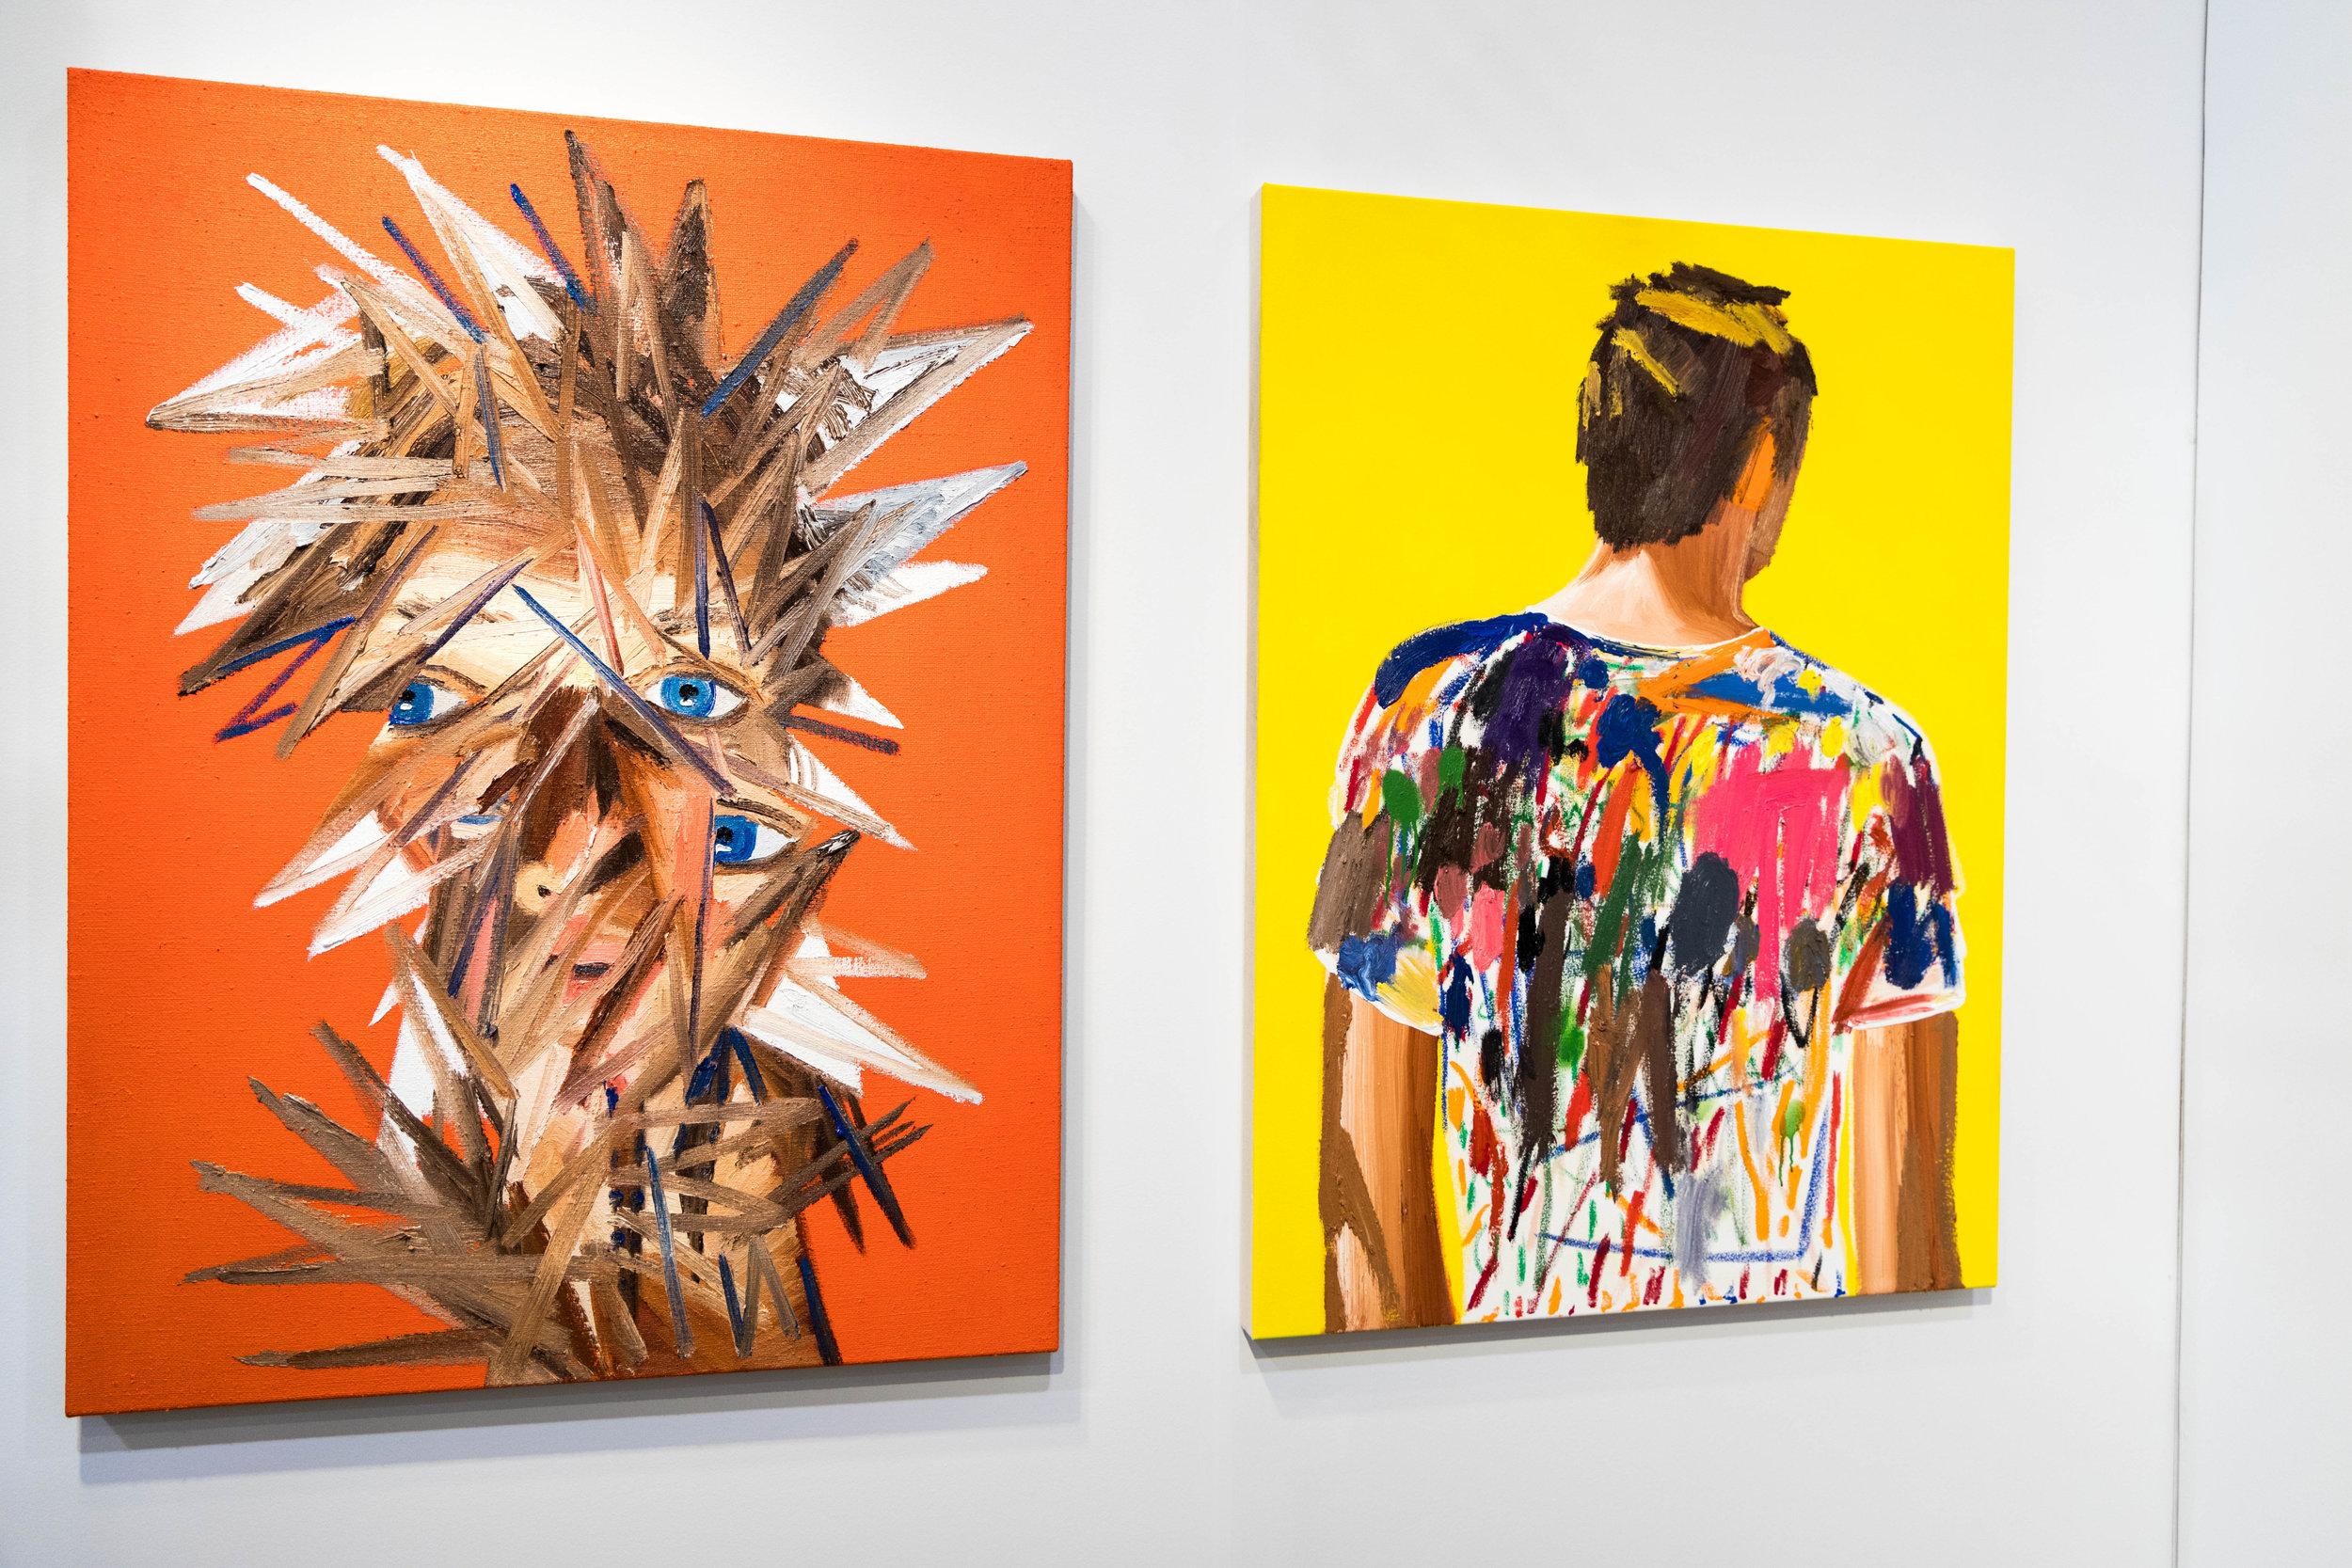 (L)  Self-Portrait (Malaga), 2017 and (R) Man in California , 2017  Erik Olson